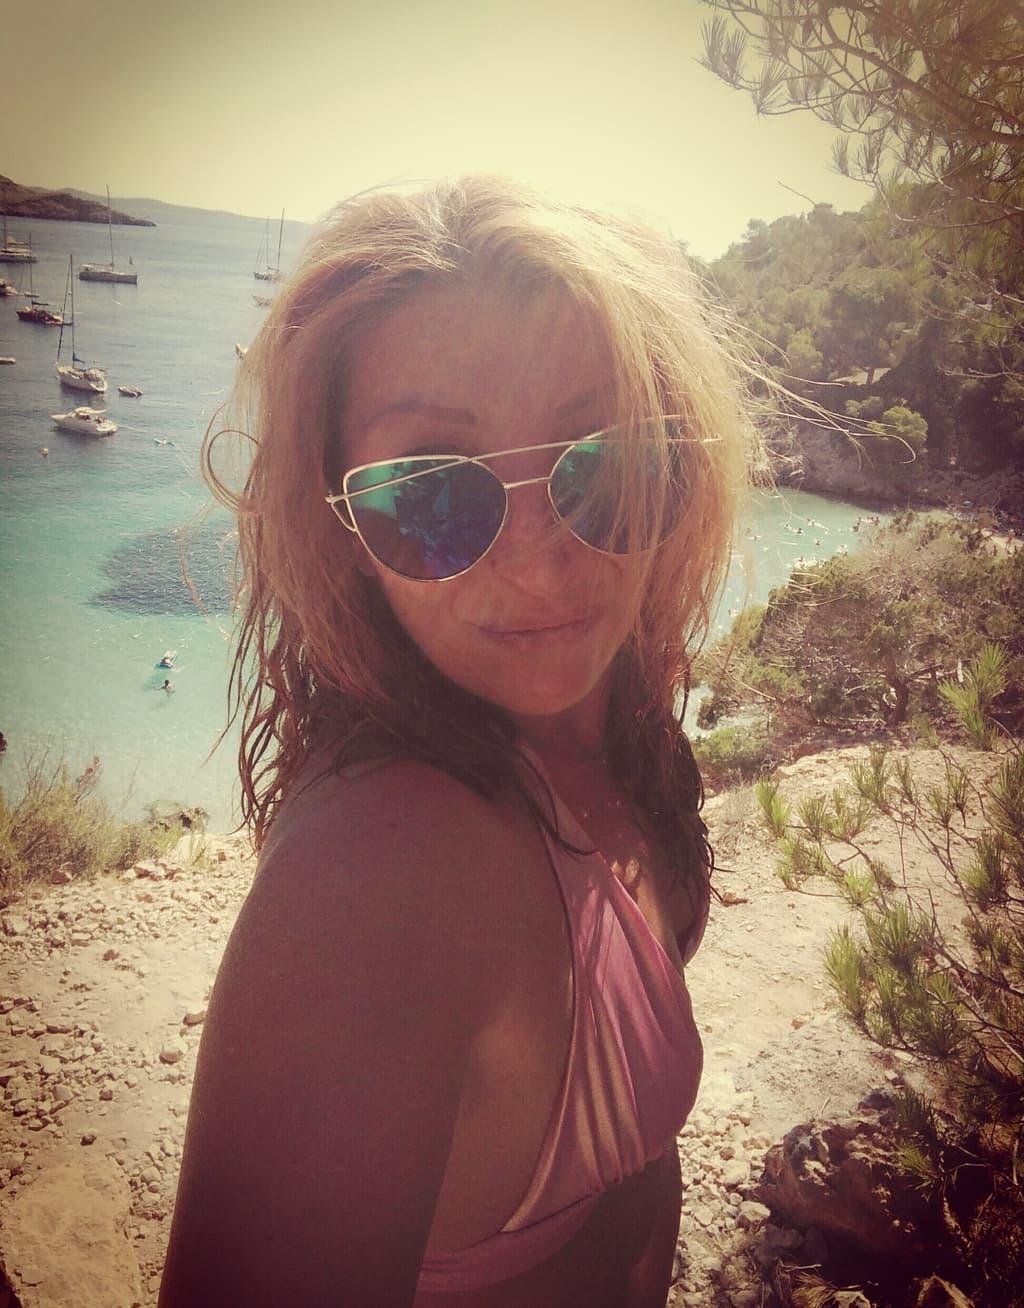 Simona.patacca@virgilio.it's picture